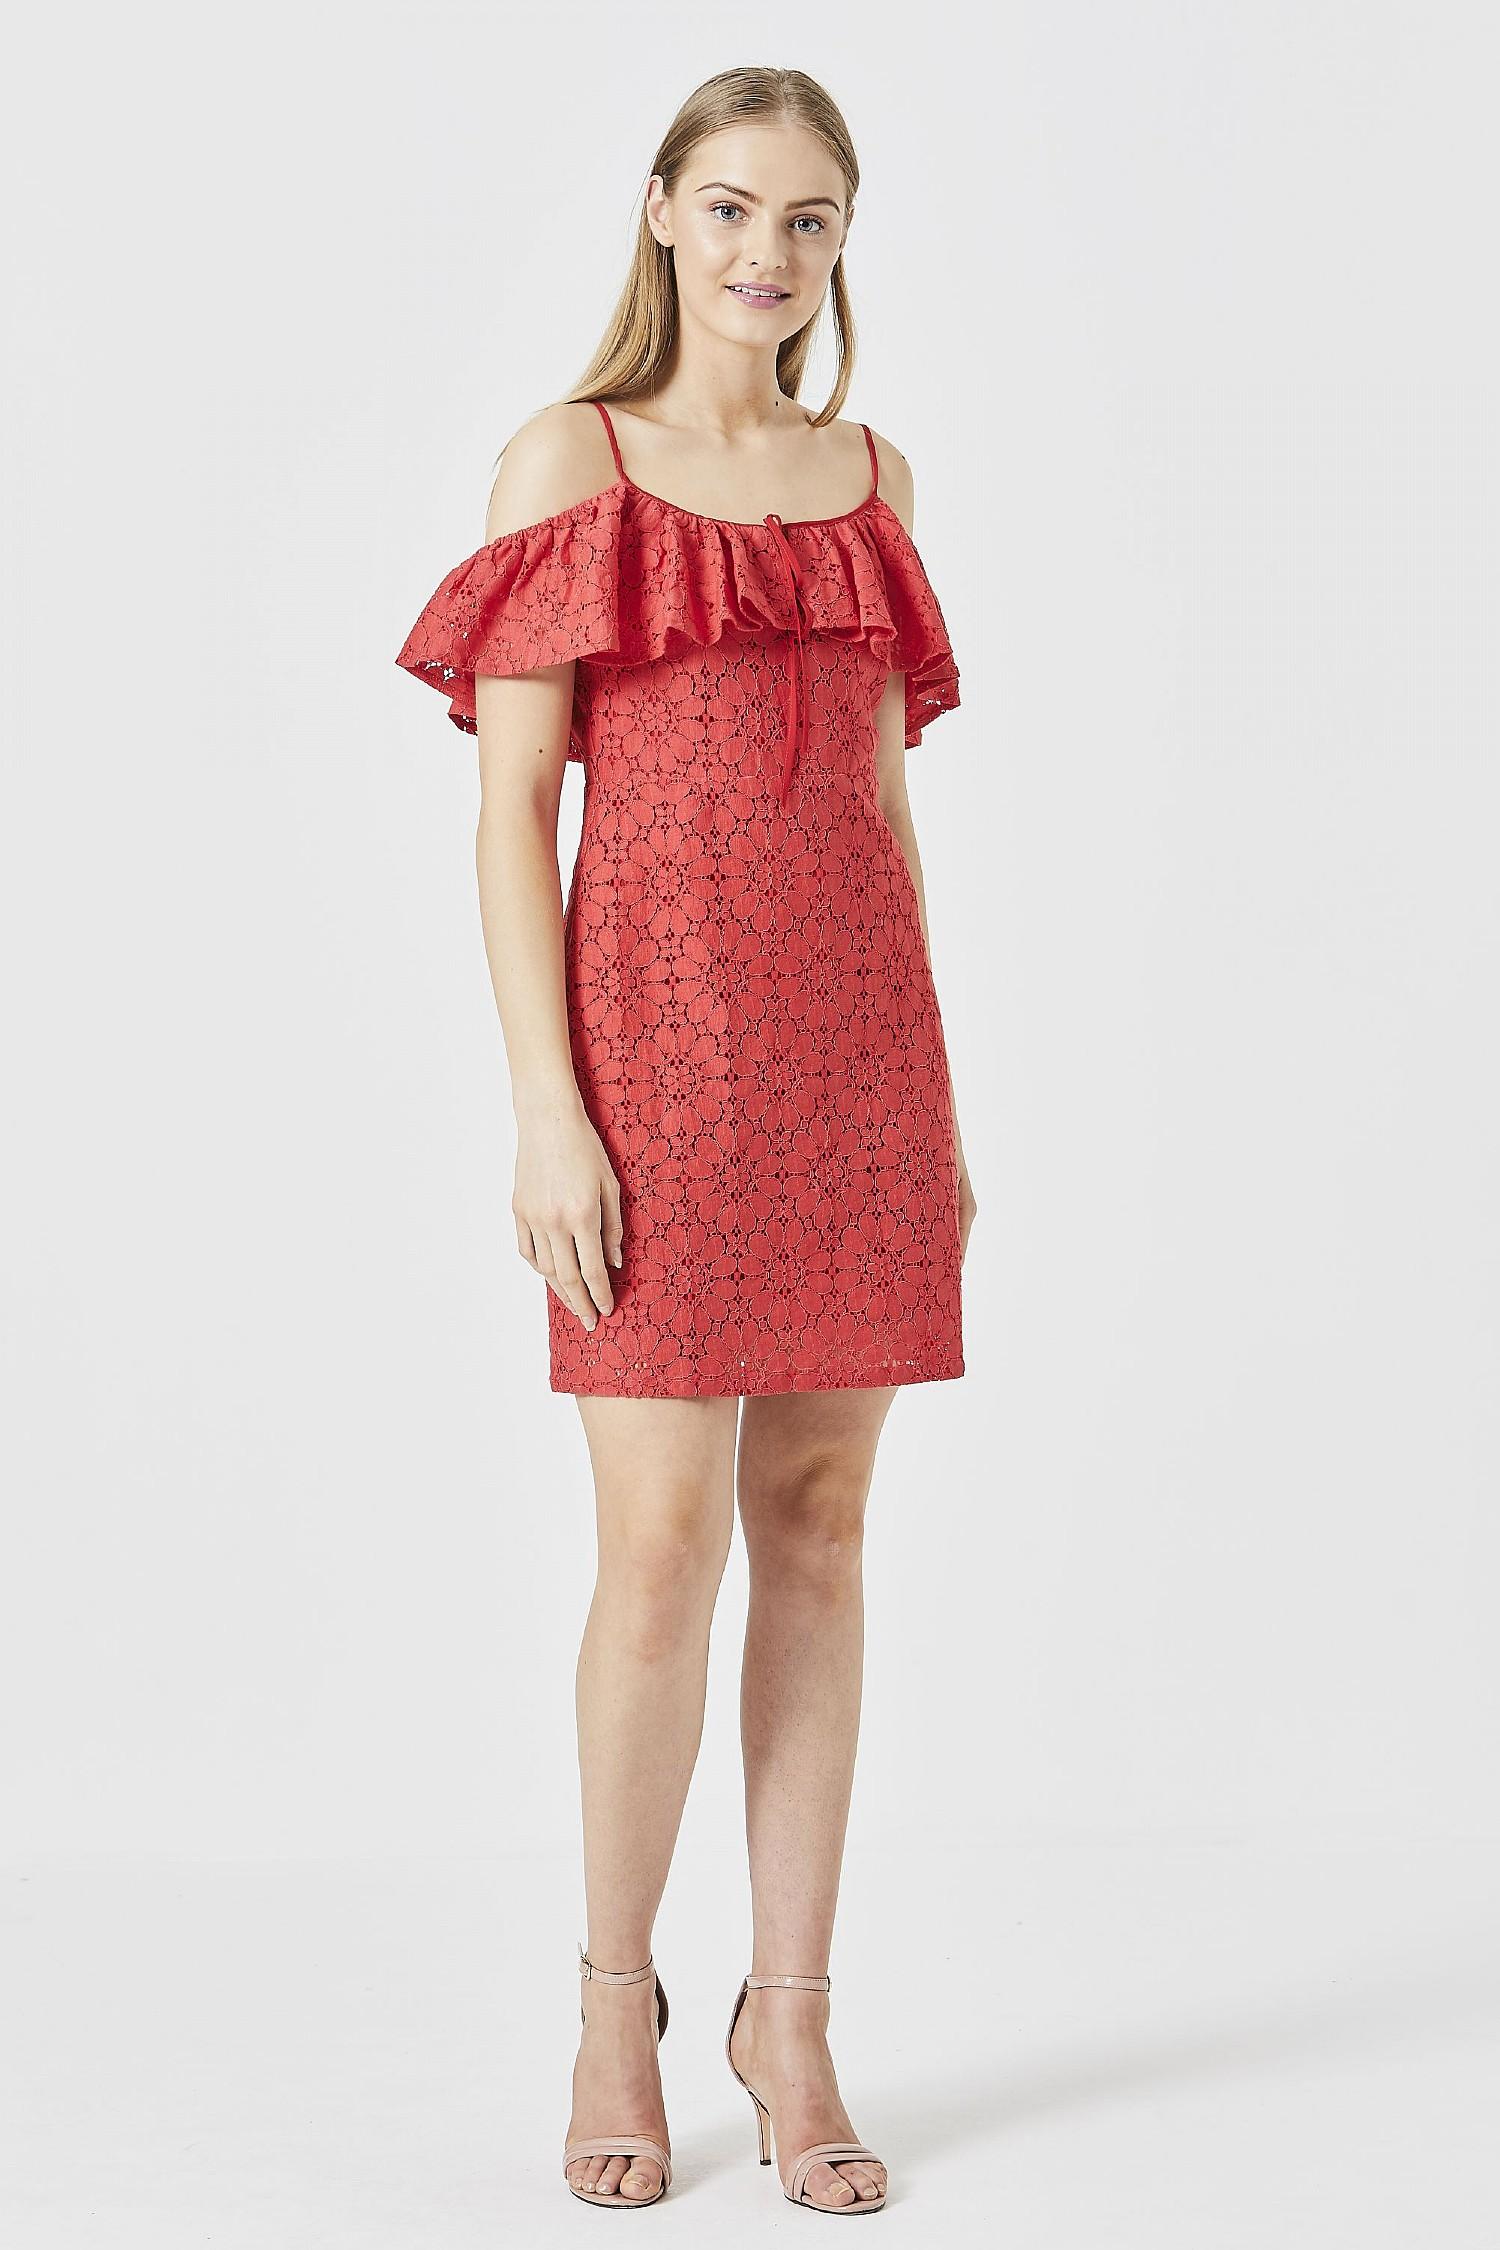 b730385d22df76 ANGELEYE Red Lace Off Shoulder Mini Dress